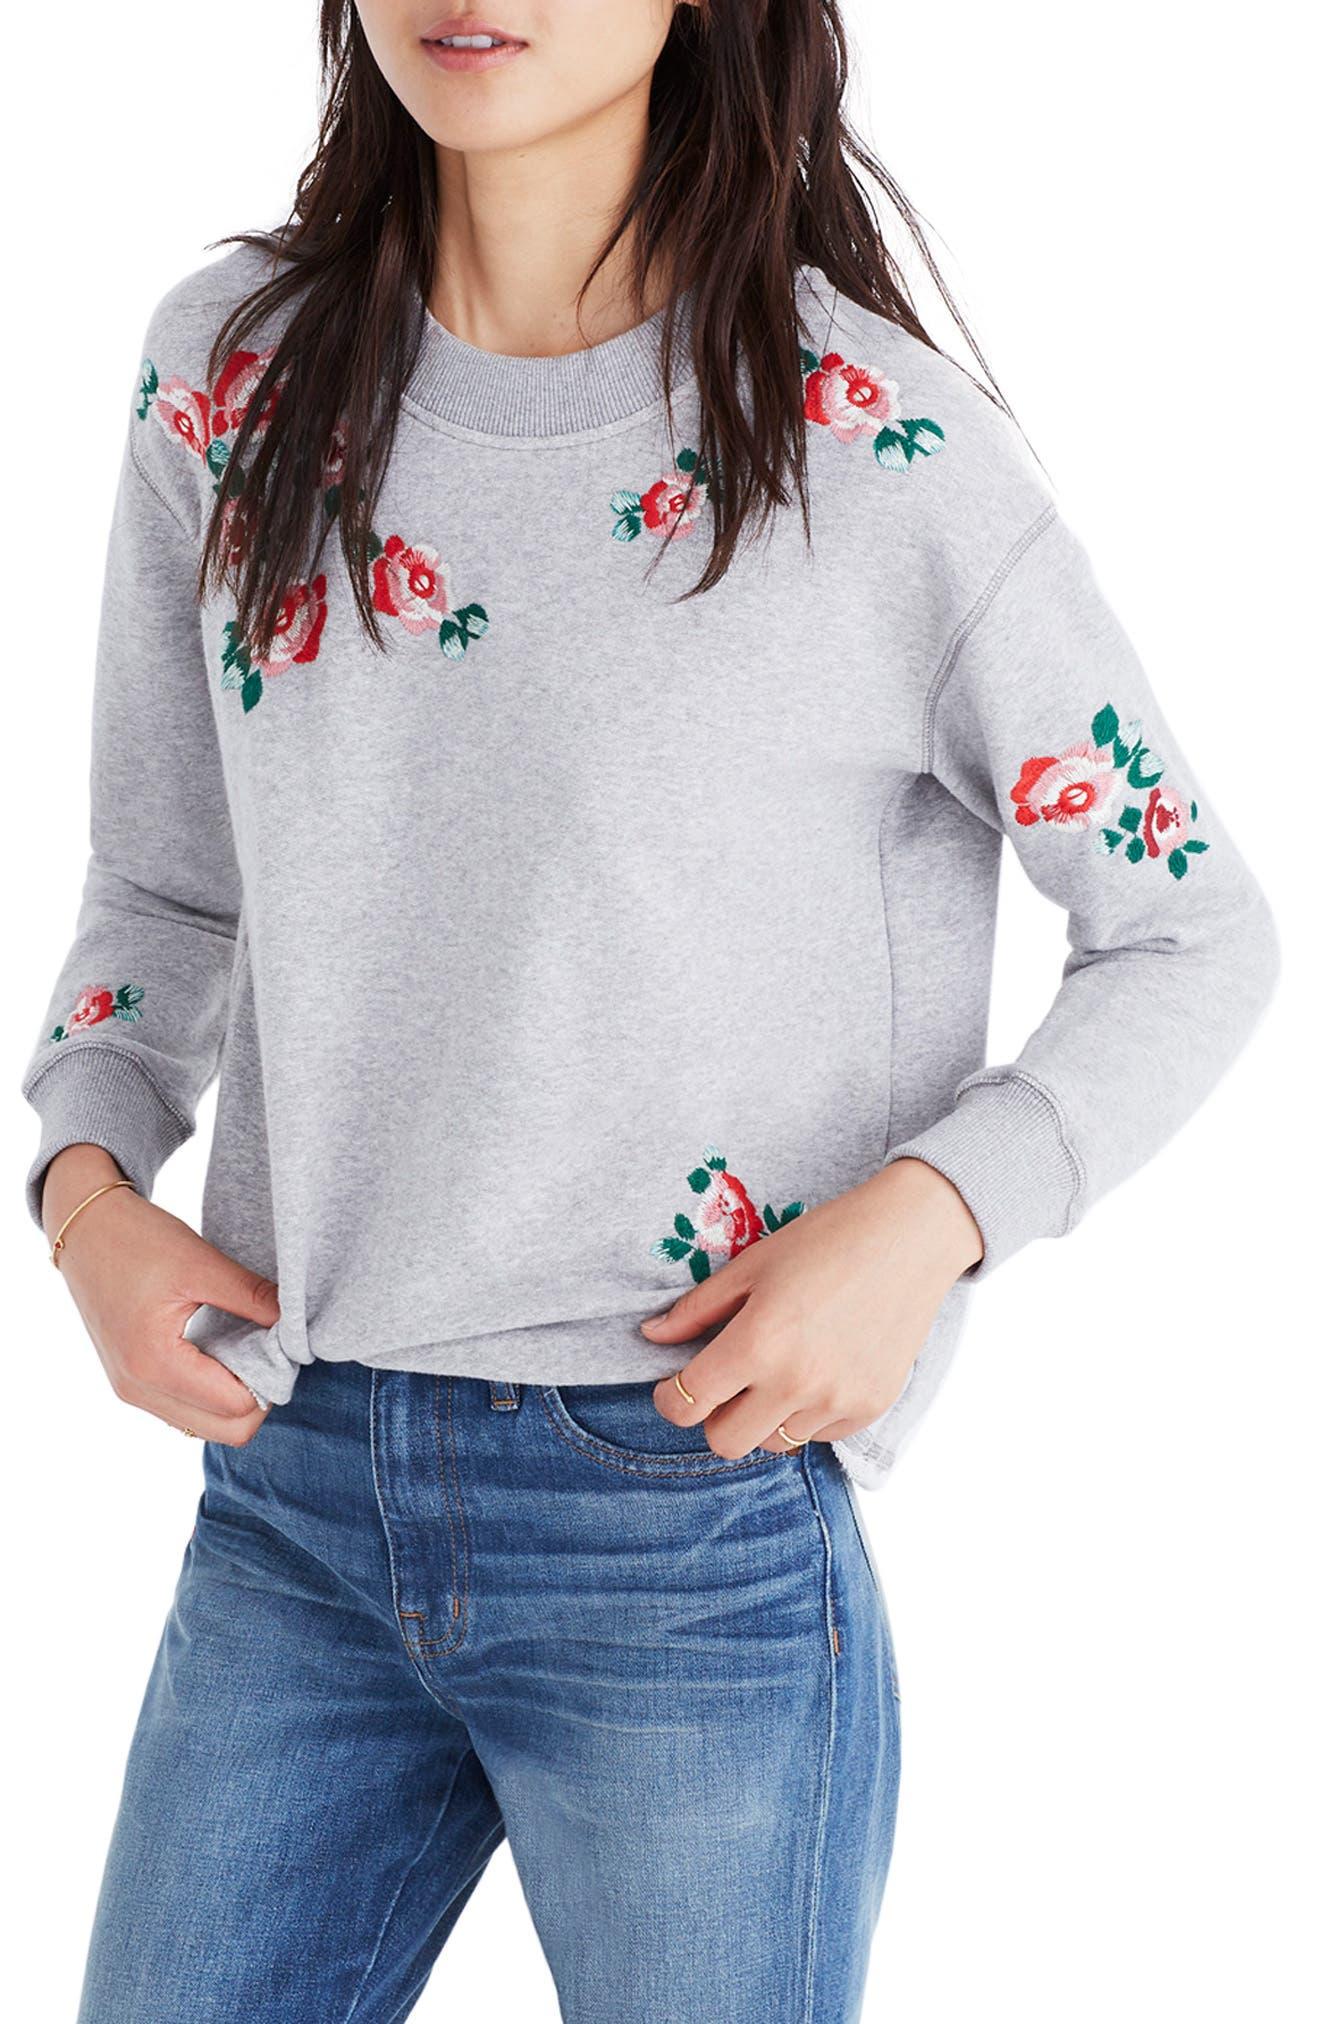 Embroidered Crop Sweatshirt,                             Main thumbnail 1, color,                             020